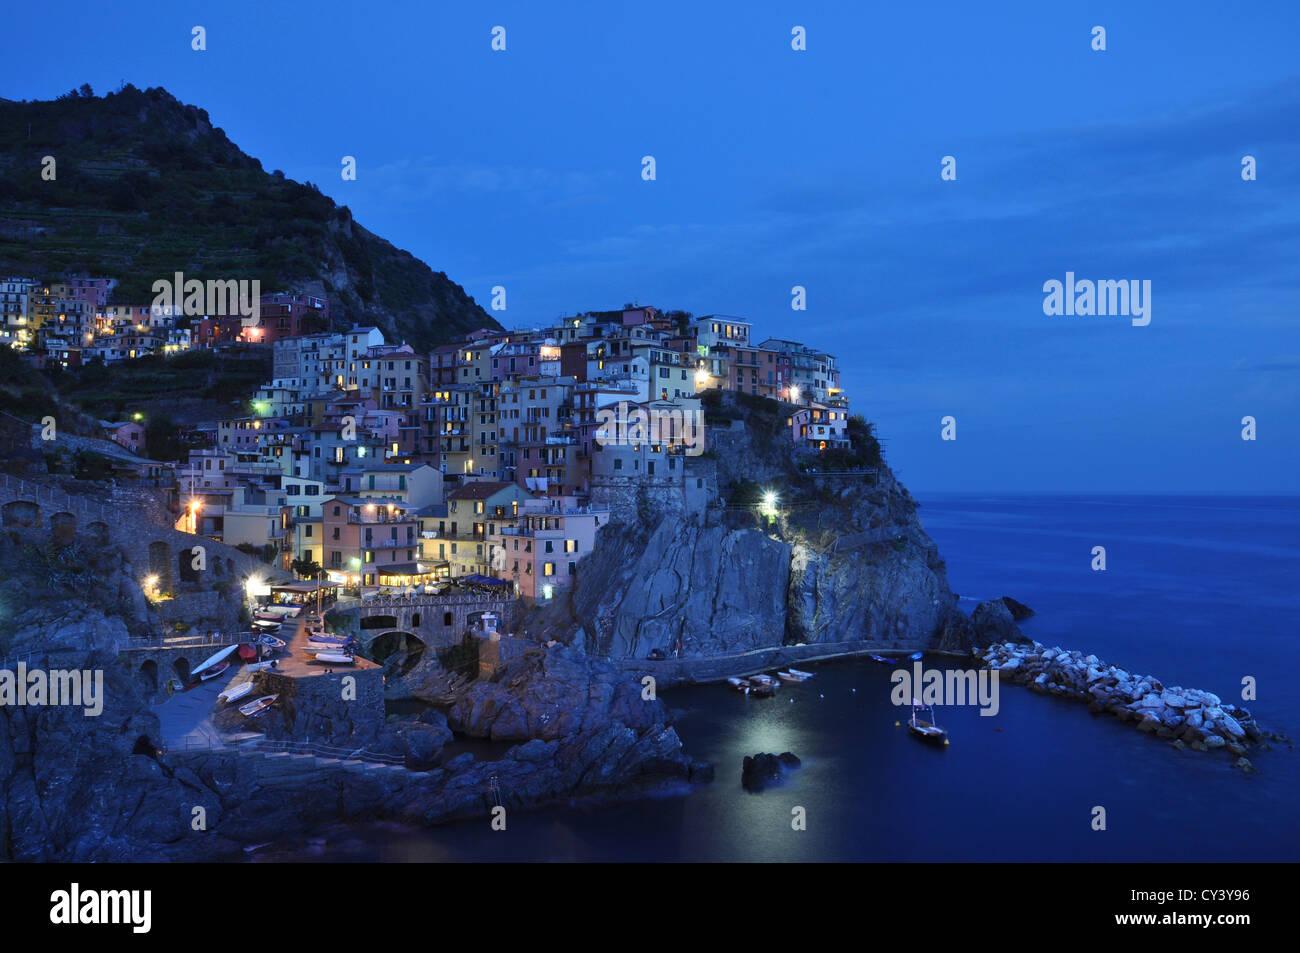 Manarola in the blue hour, Cinque Terre, Italy - Stock Image